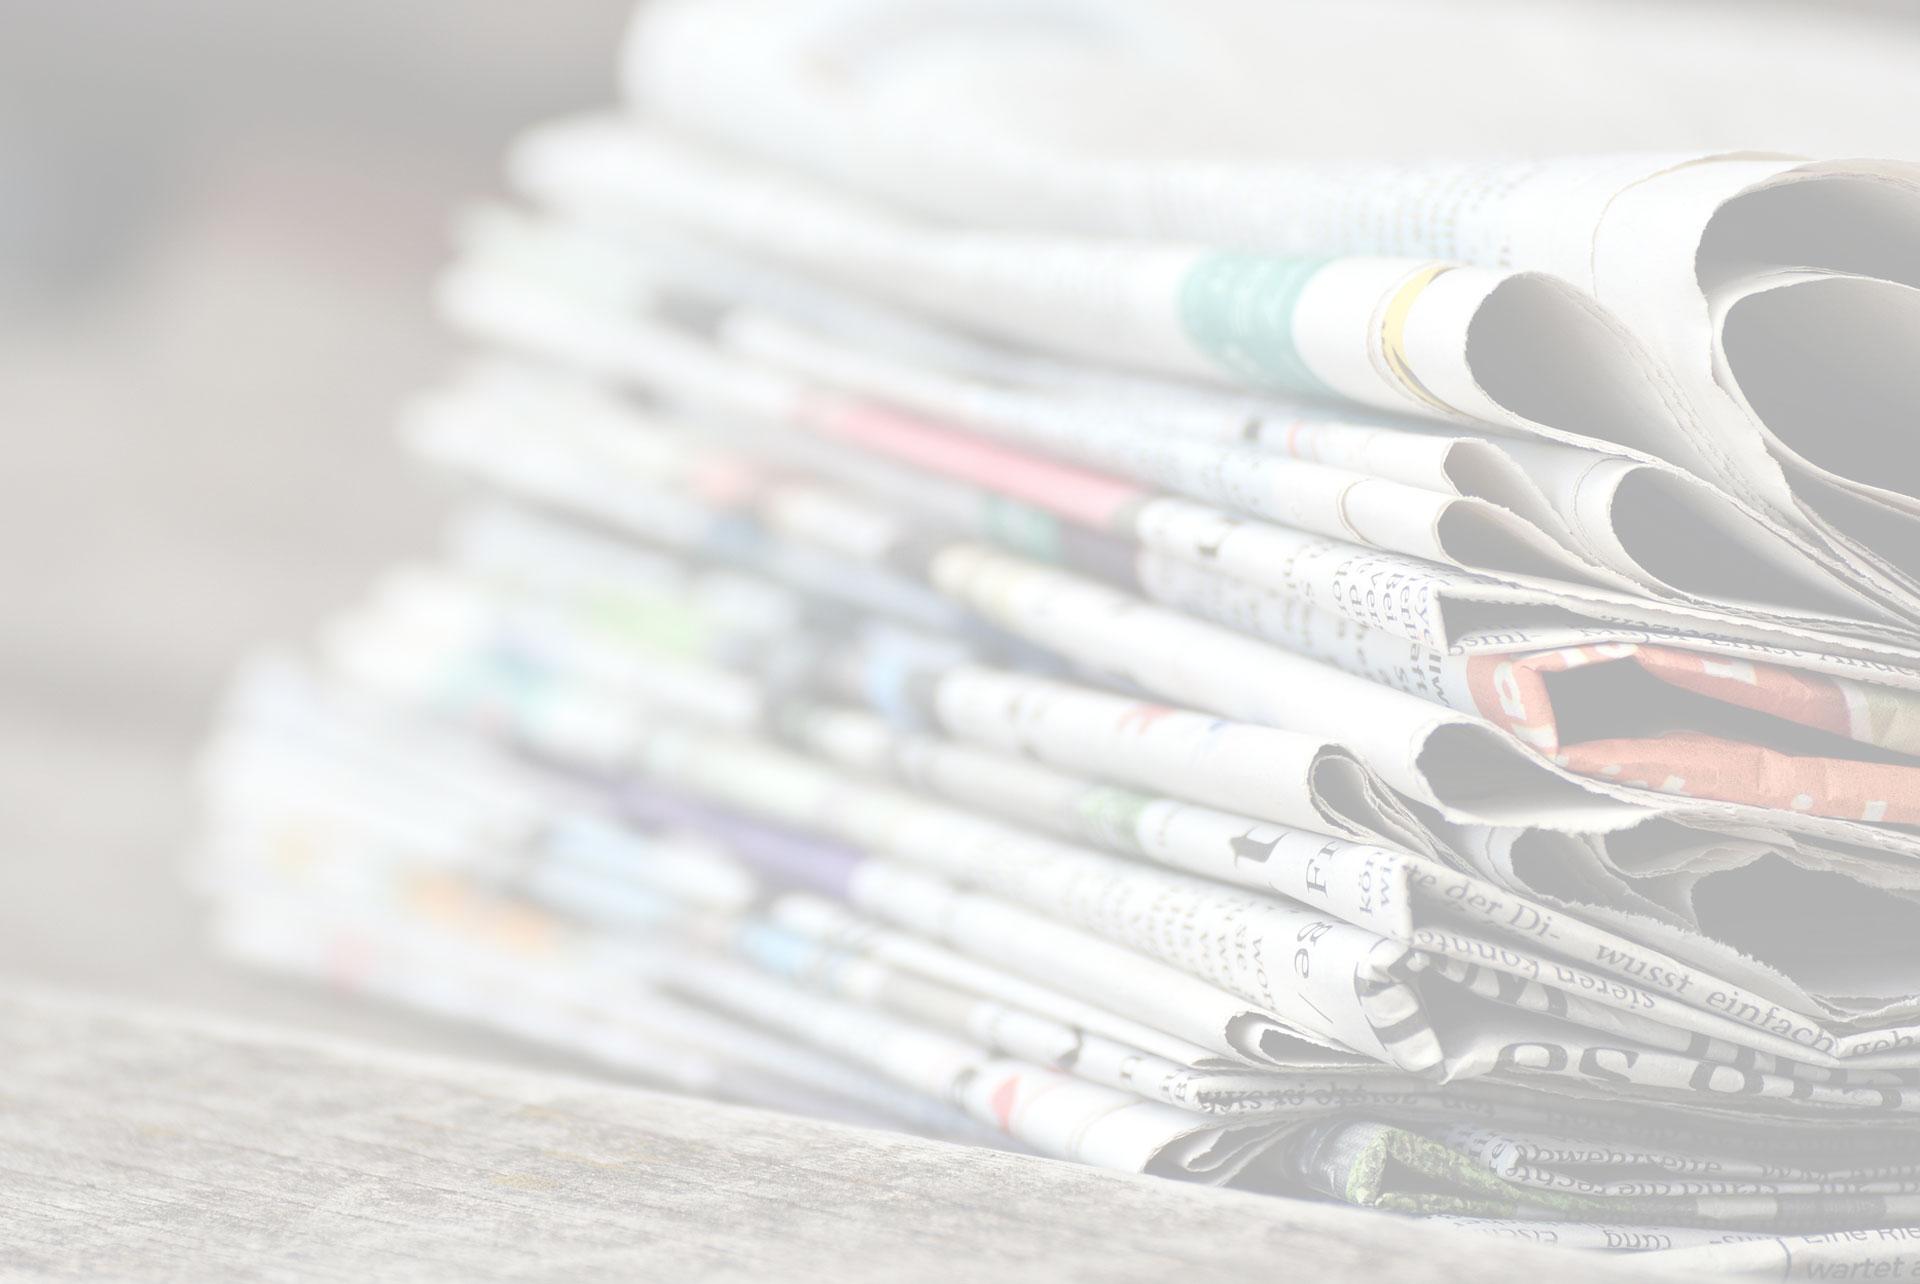 Brescia-Udinese